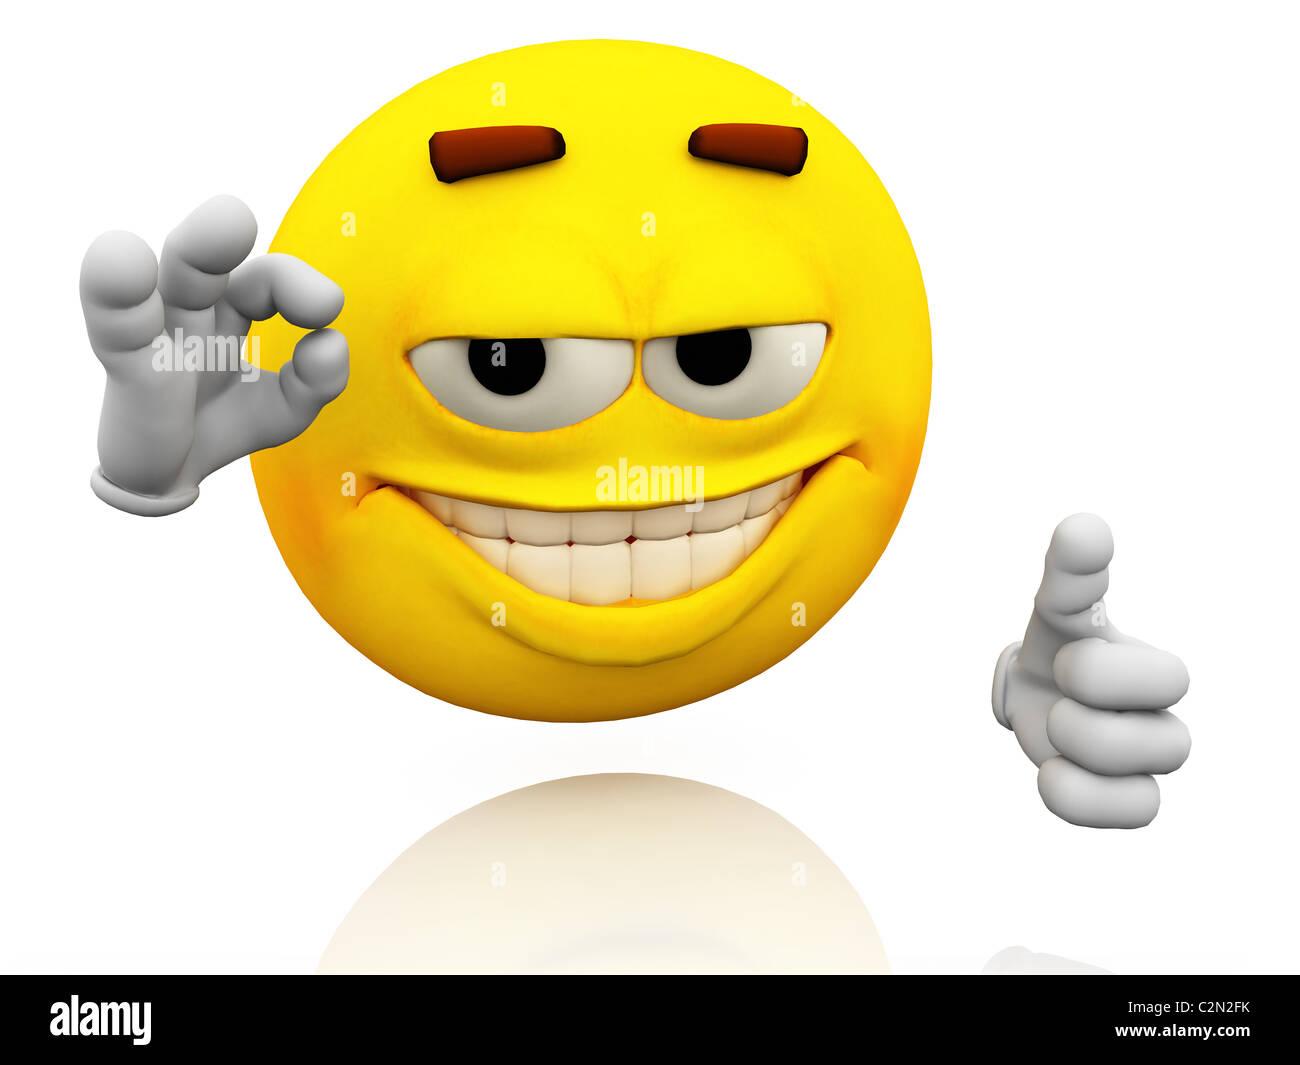 smiley emoticon facial expression hot emotional